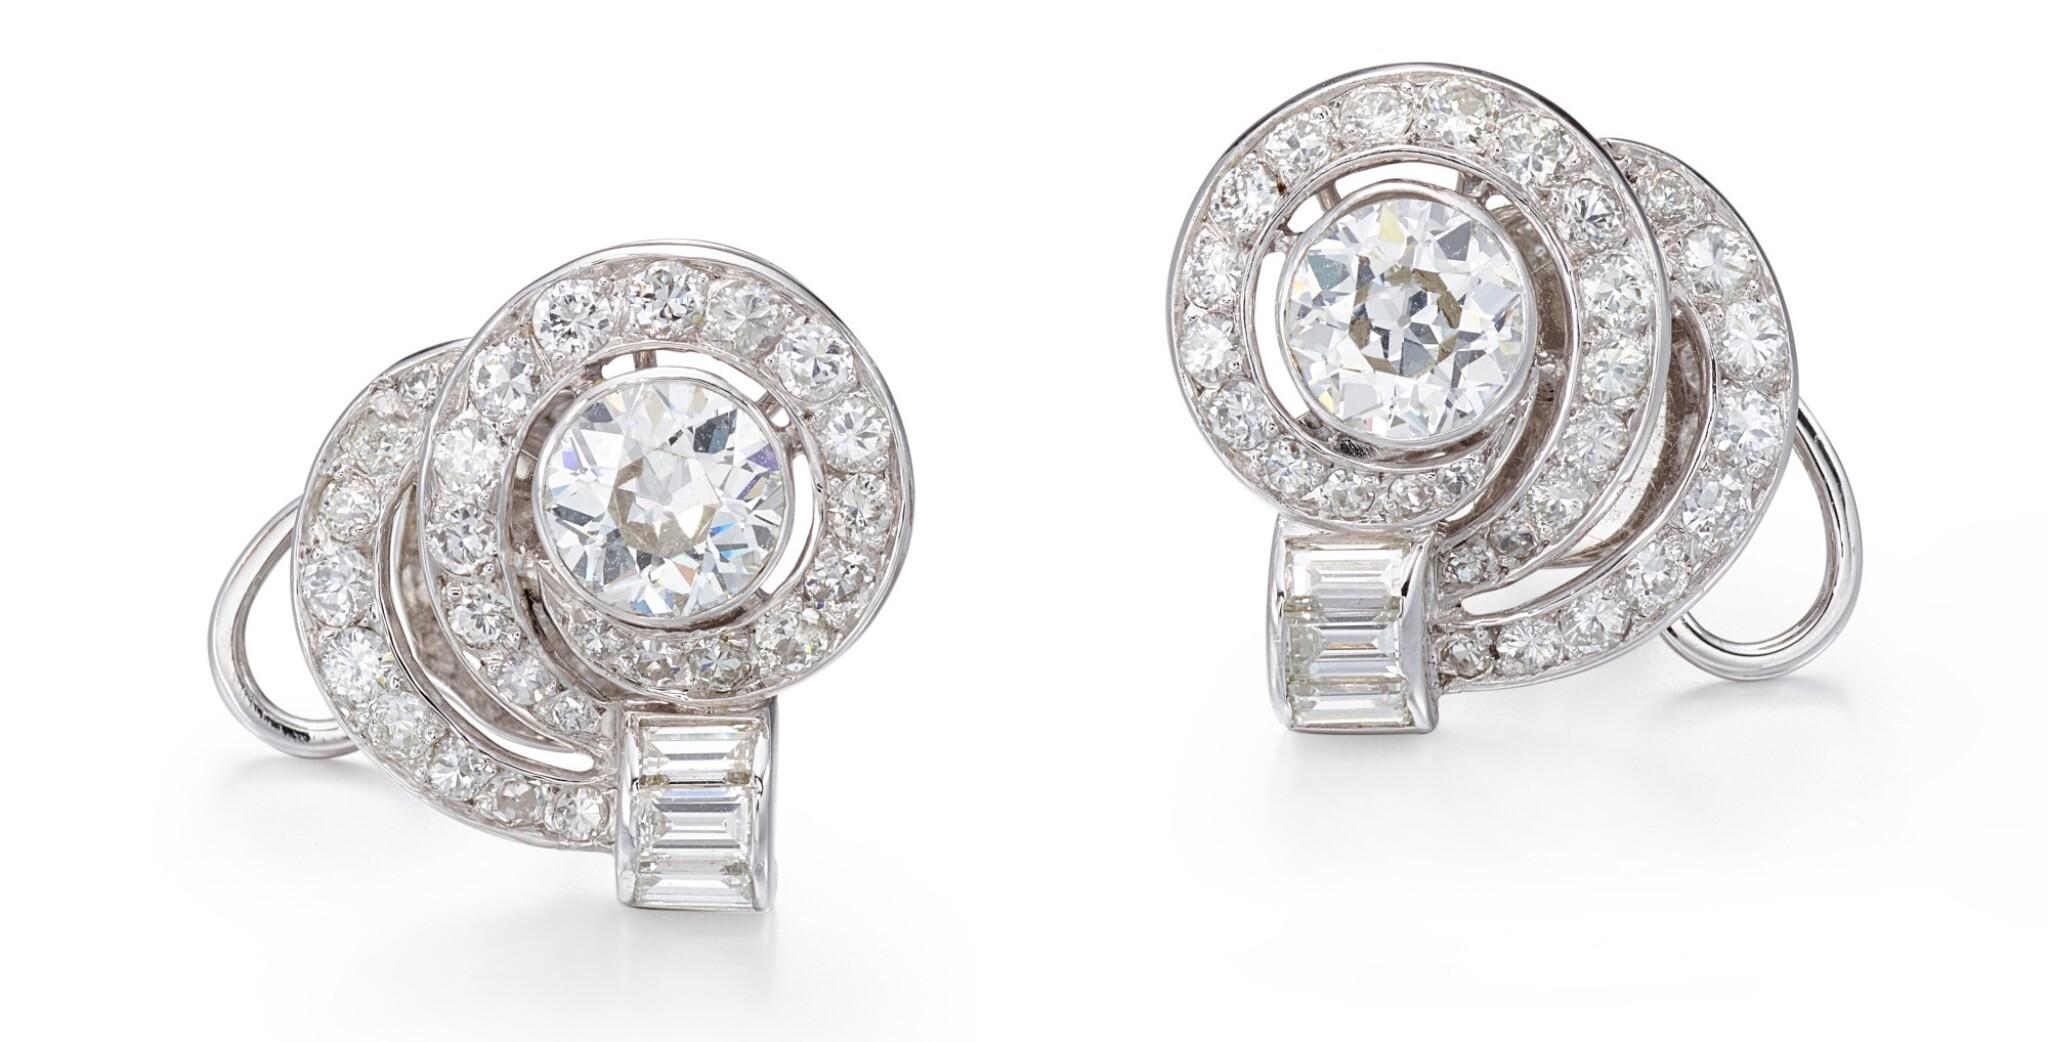 View full screen - View 1 of Lot 1001. PAIR OF DIAMOND EARRINGS   鑽石耳環一對.